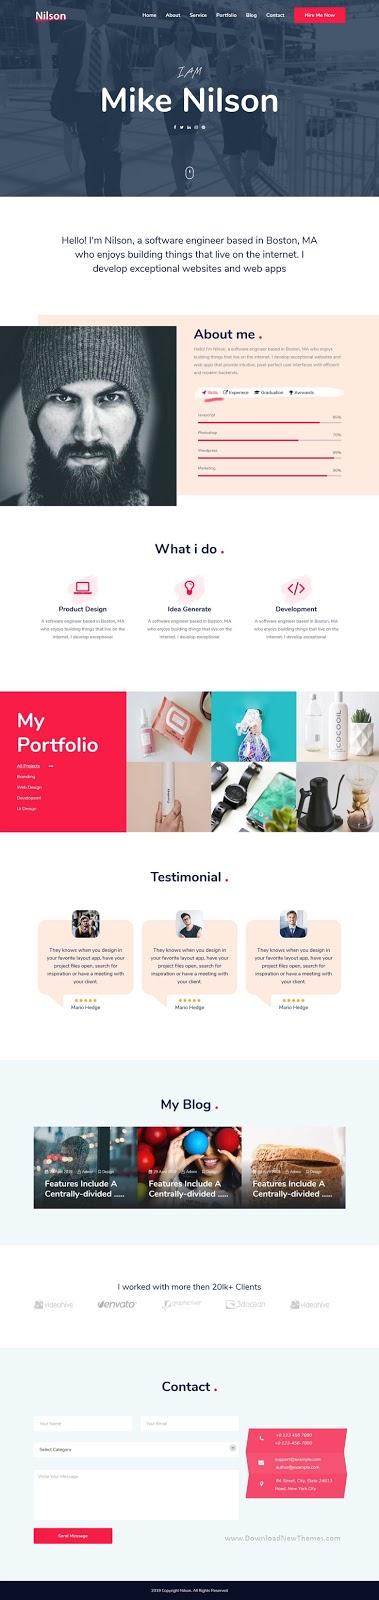 Nilson - Multipurpose Personal Resume & Portfolio Template